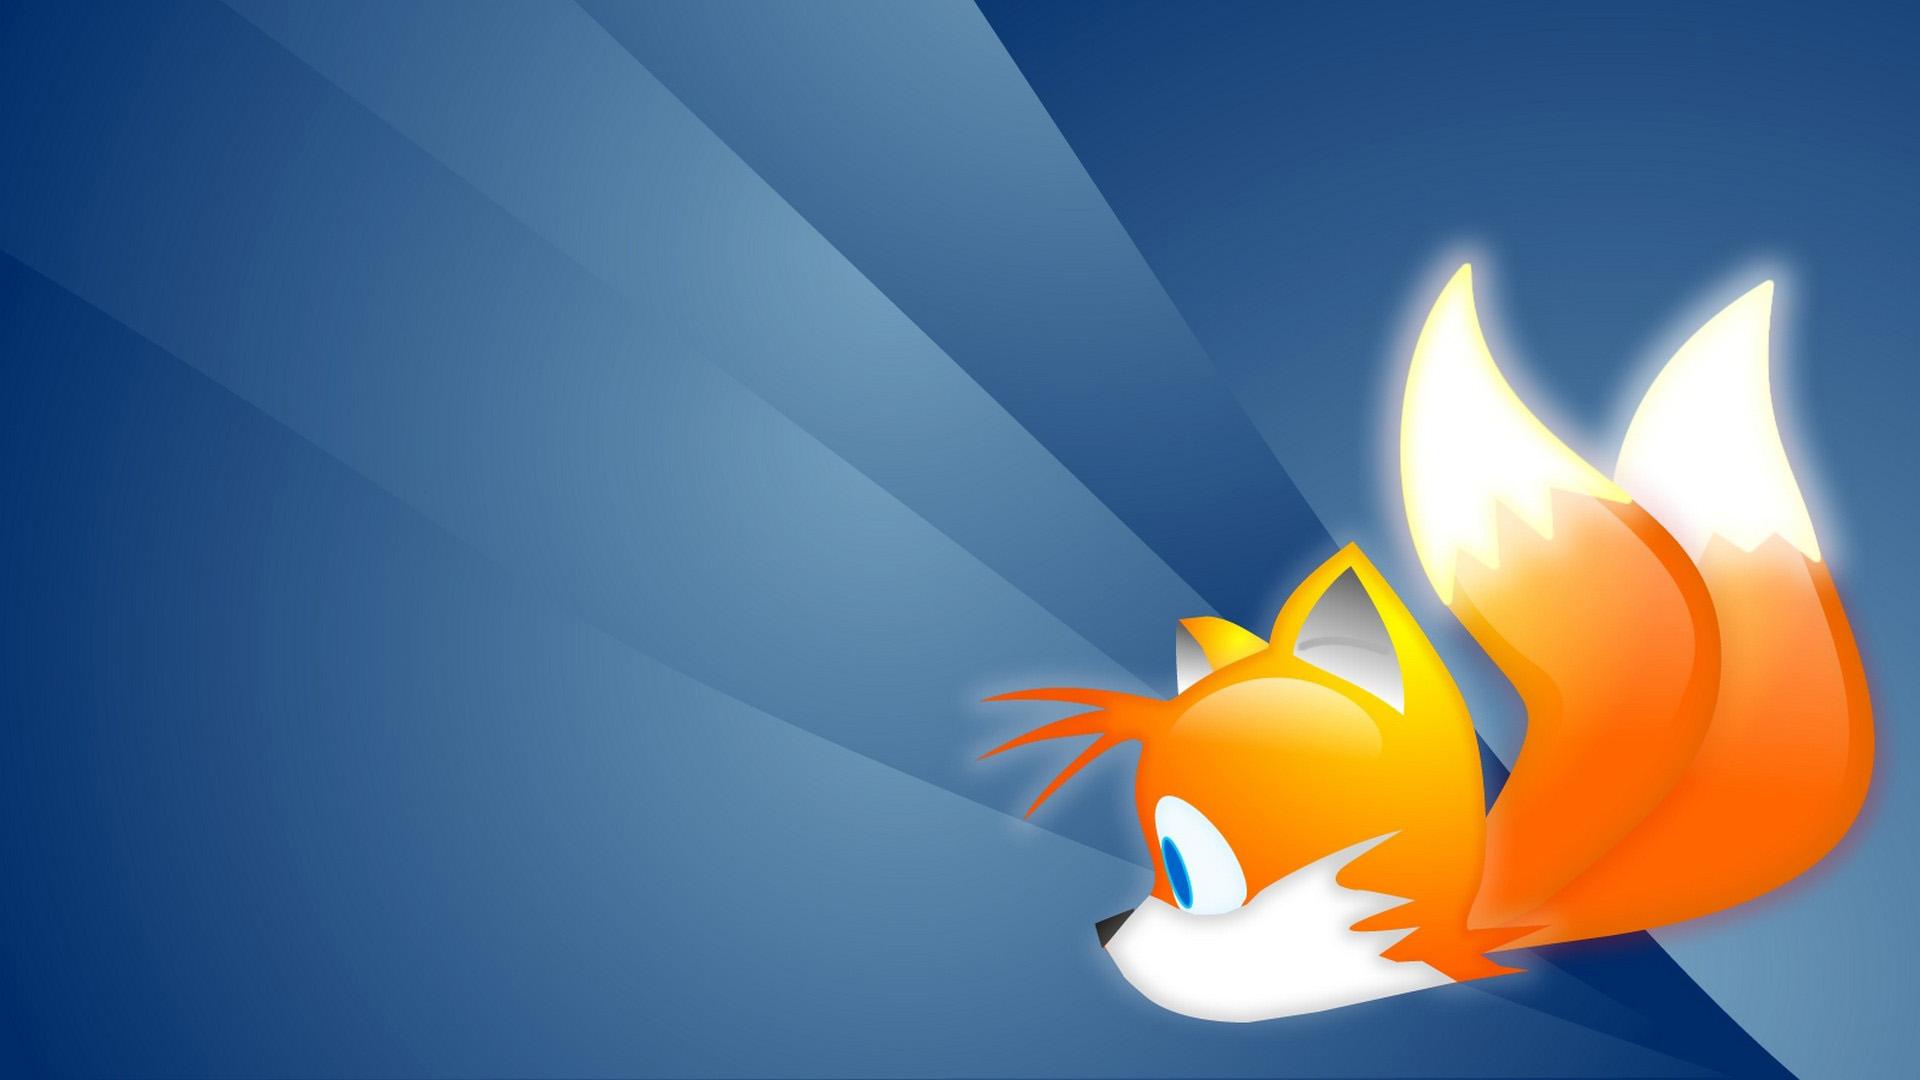 Открытки, картинки на яндекс браузер двигающиеся